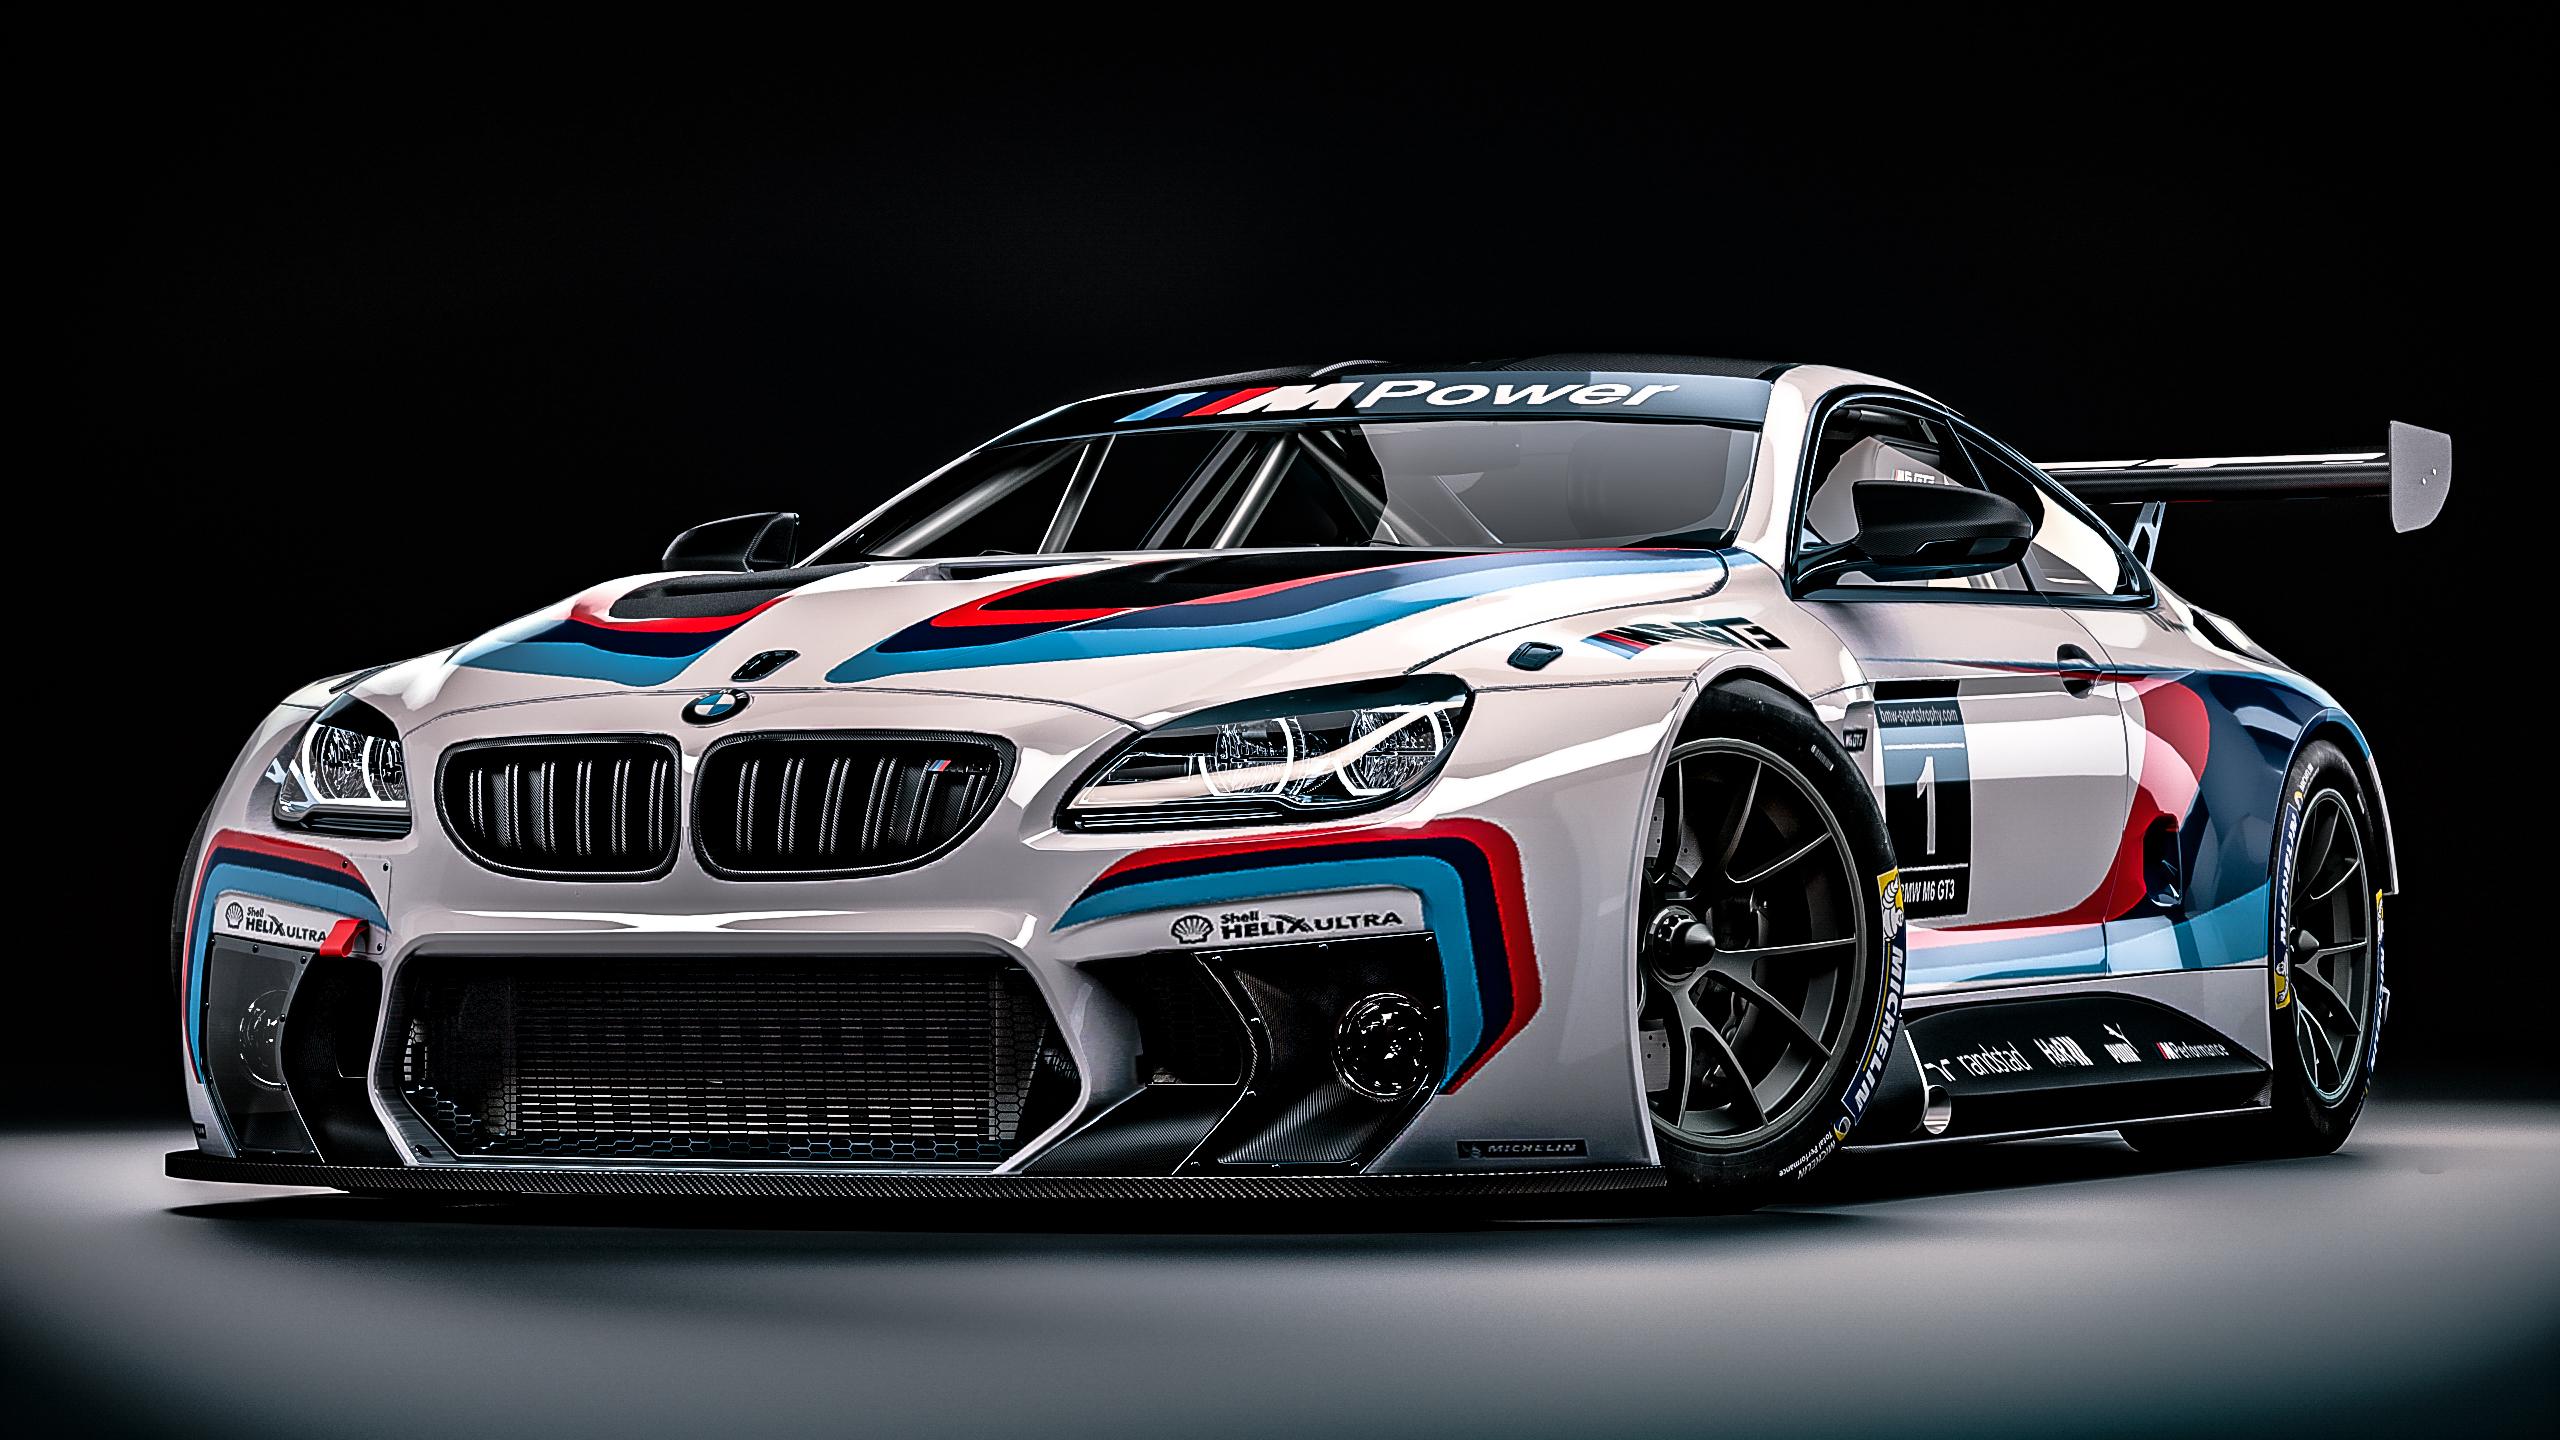 2016 BMW M6 GT3 by nancorocks on DeviantArt